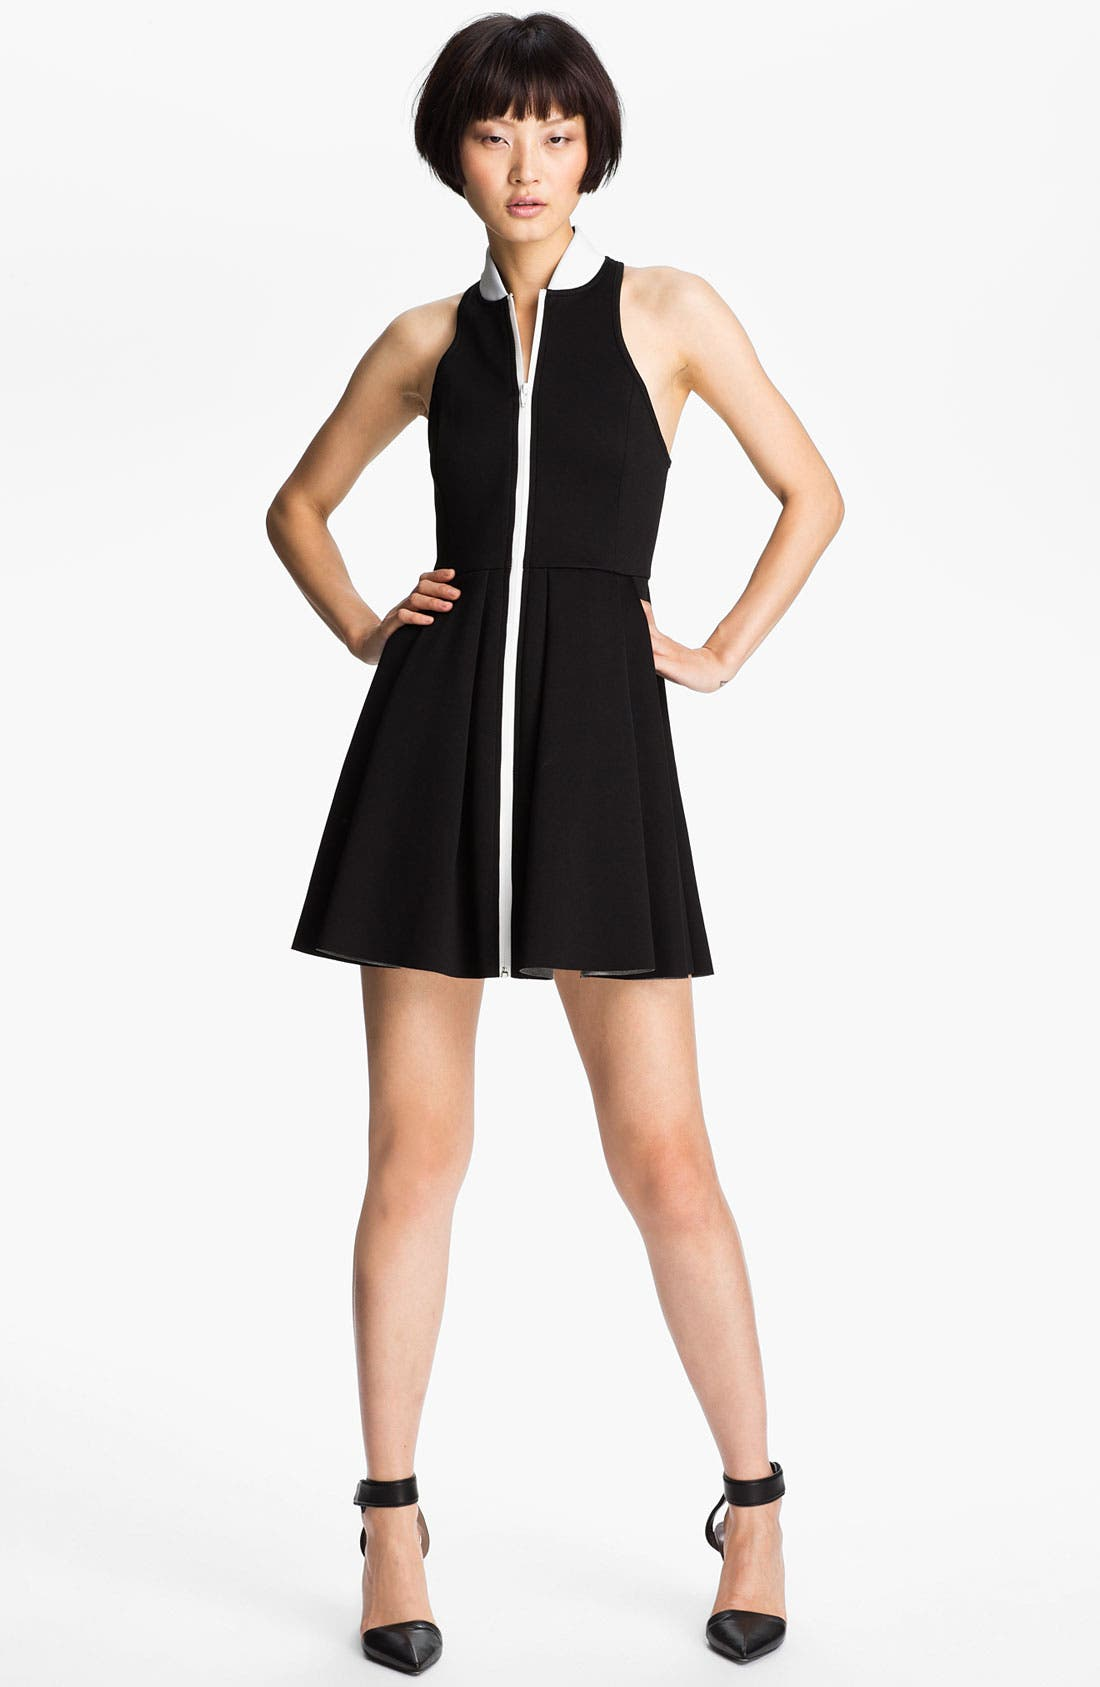 Alternate Image 1 Selected - T by Alexander Wang Neoprene Dress